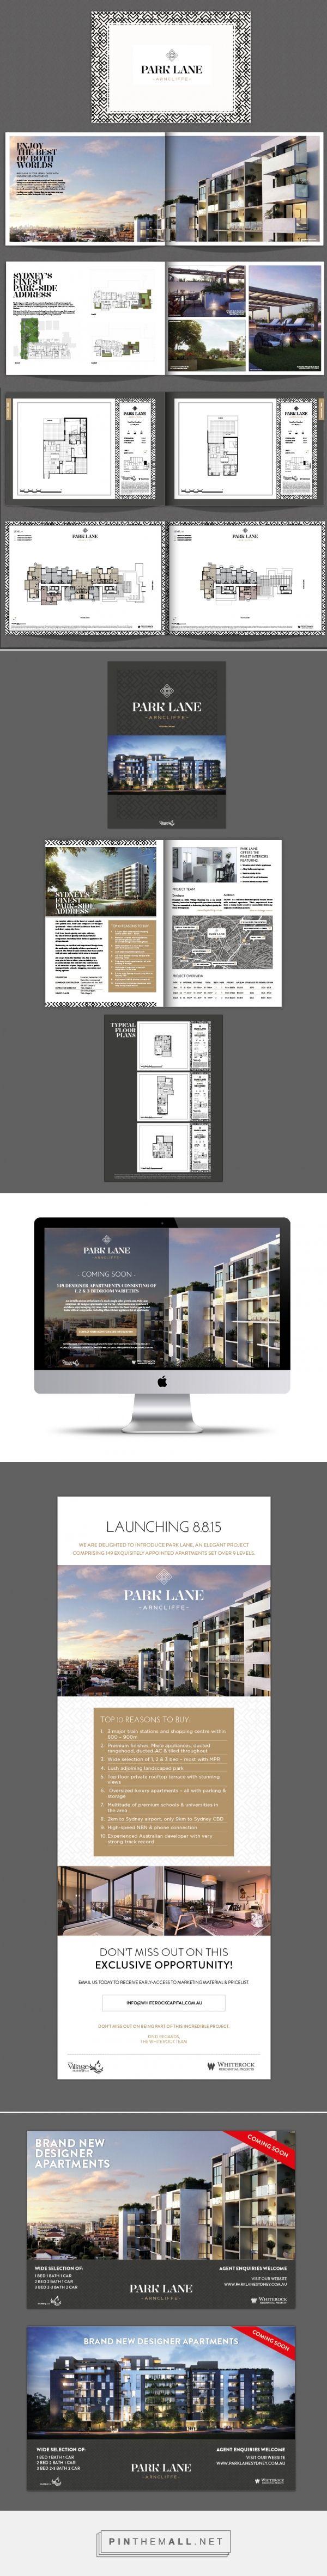 Park Lane - Property Branding on Behance - created via http://pinthemall.net